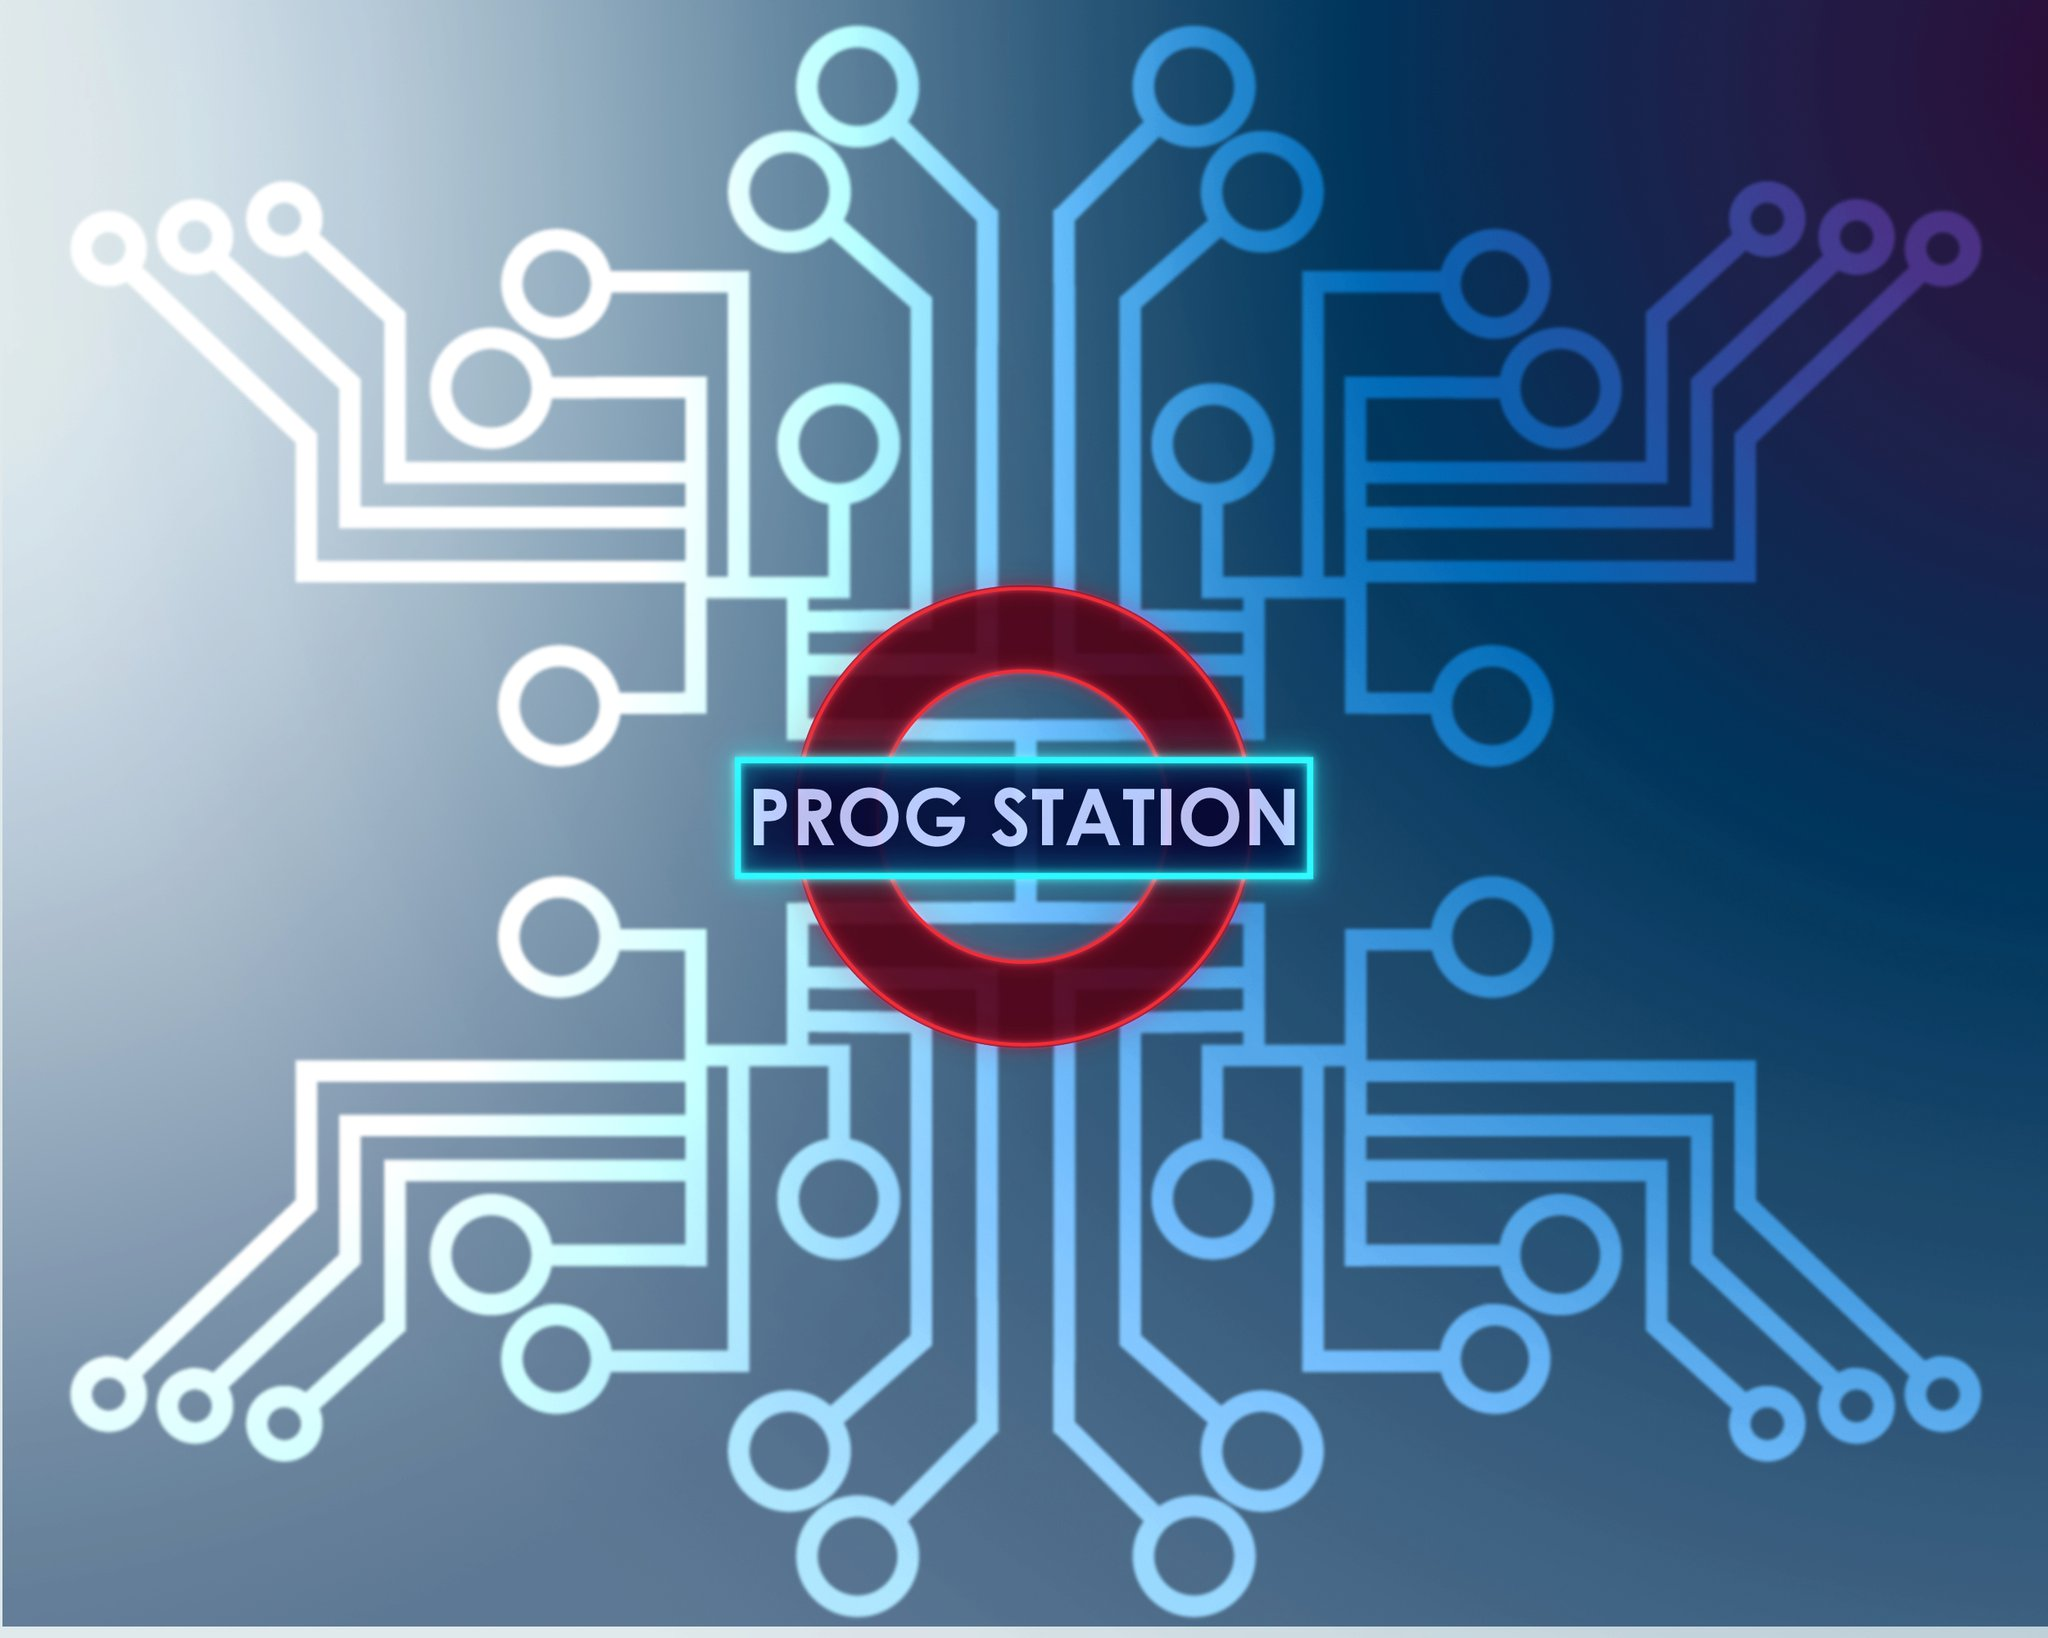 Prog Station 2018 Psytards Reunion